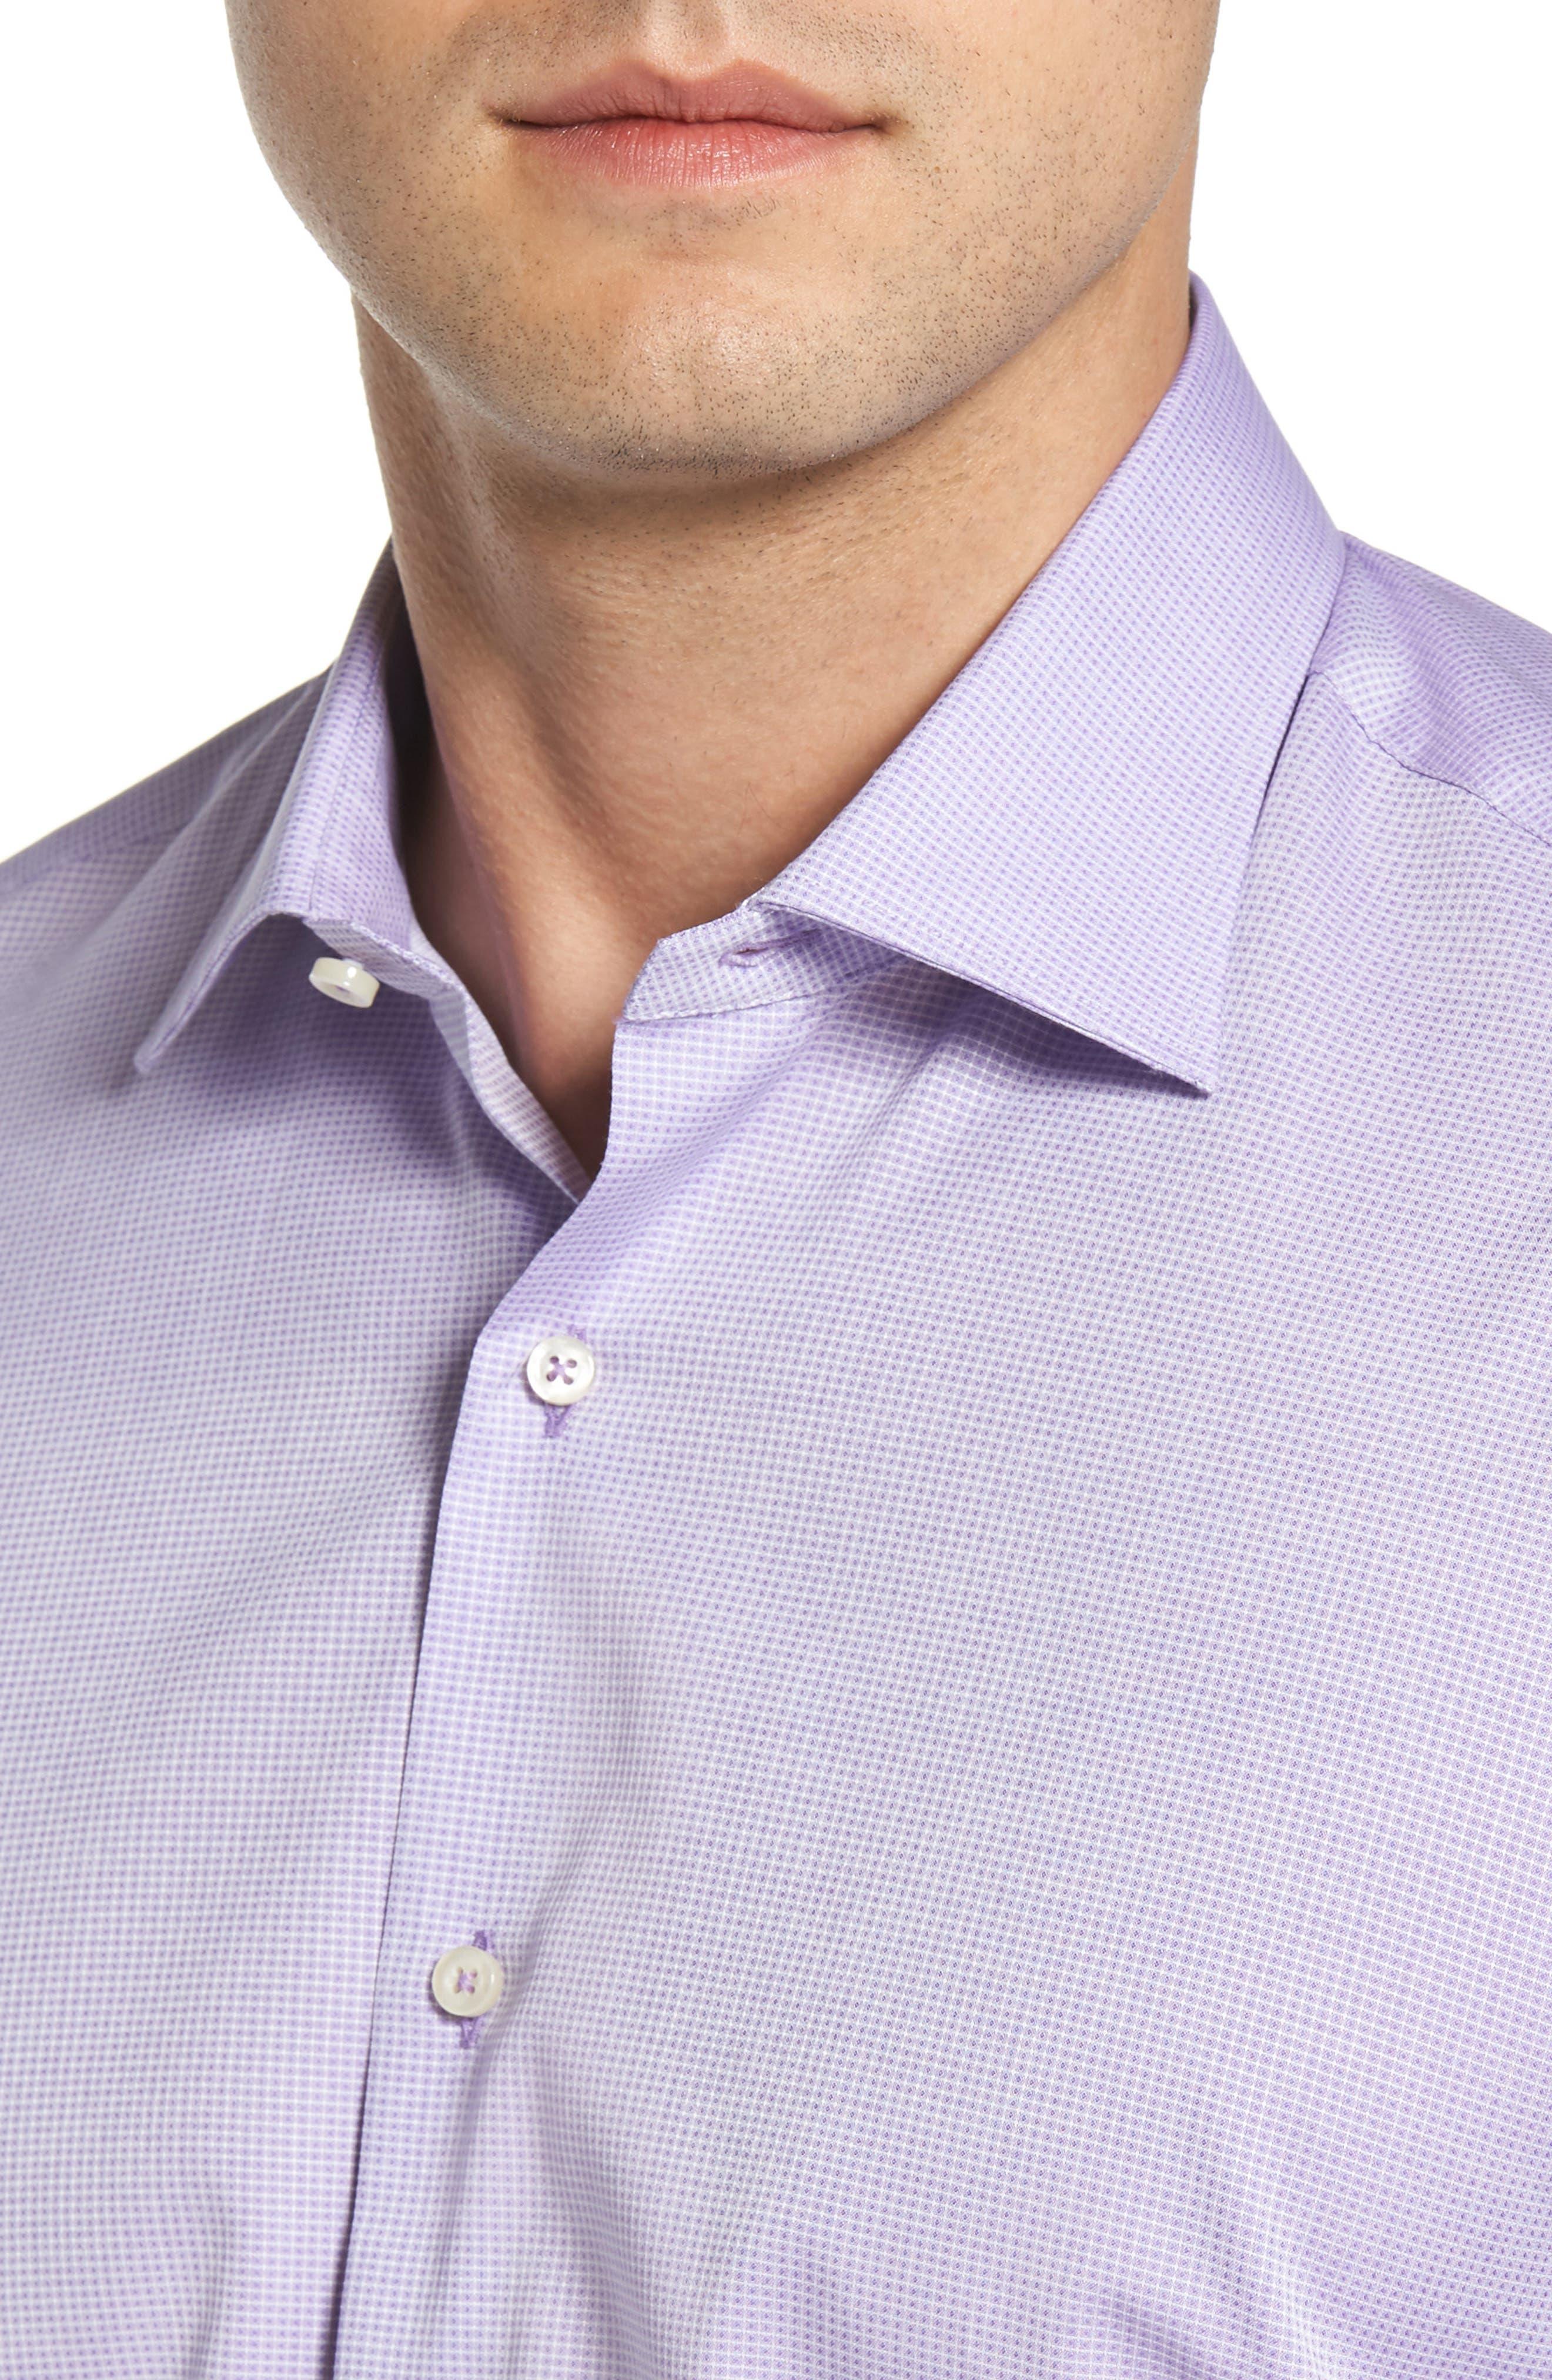 Regular Fit Solid Dress Shirt,                             Alternate thumbnail 2, color,                             500